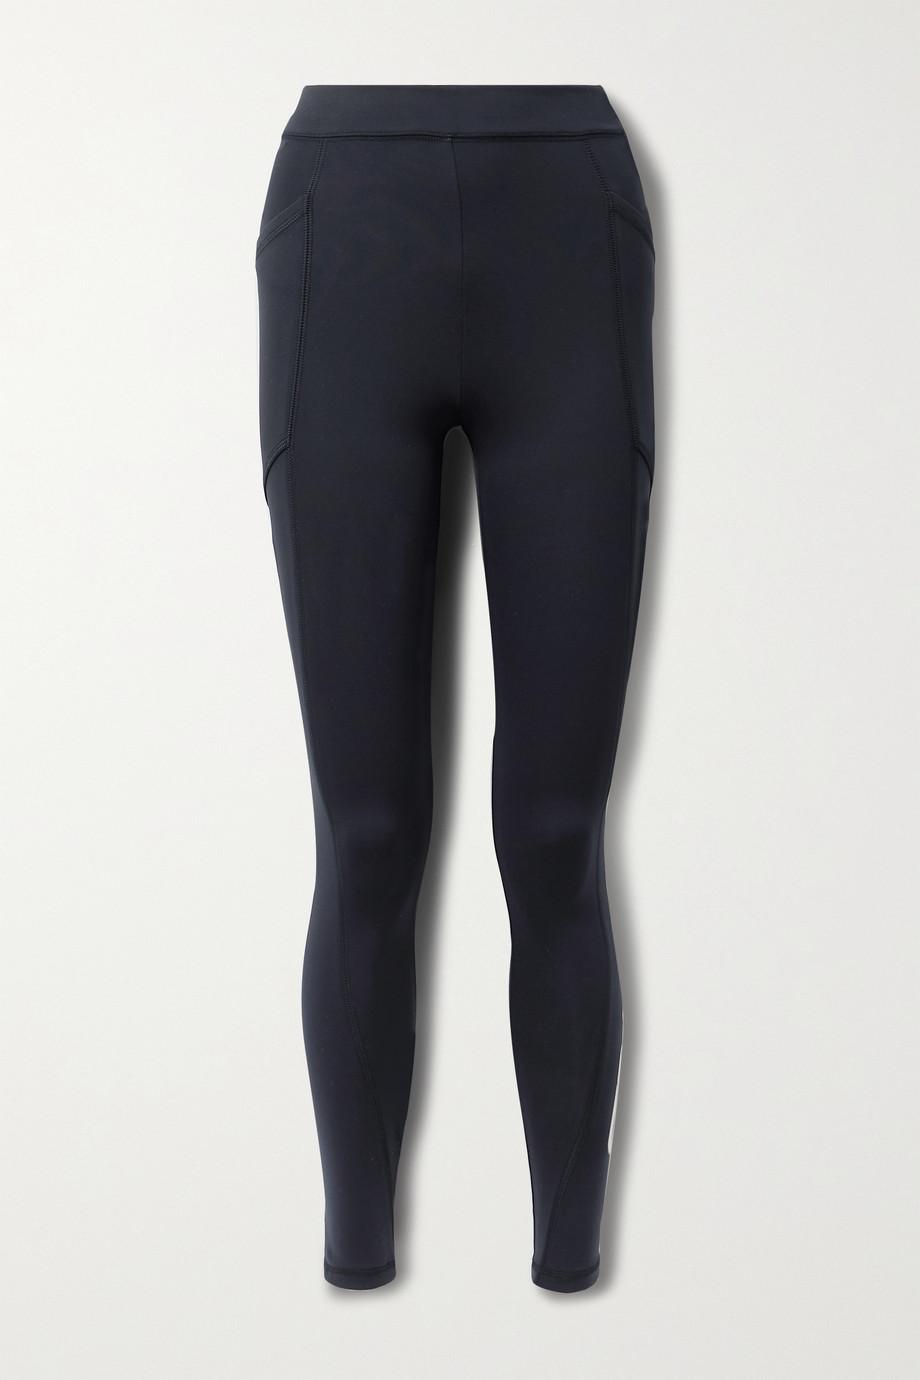 Stella McCartney Legging en jersey technique imprimé Scuba